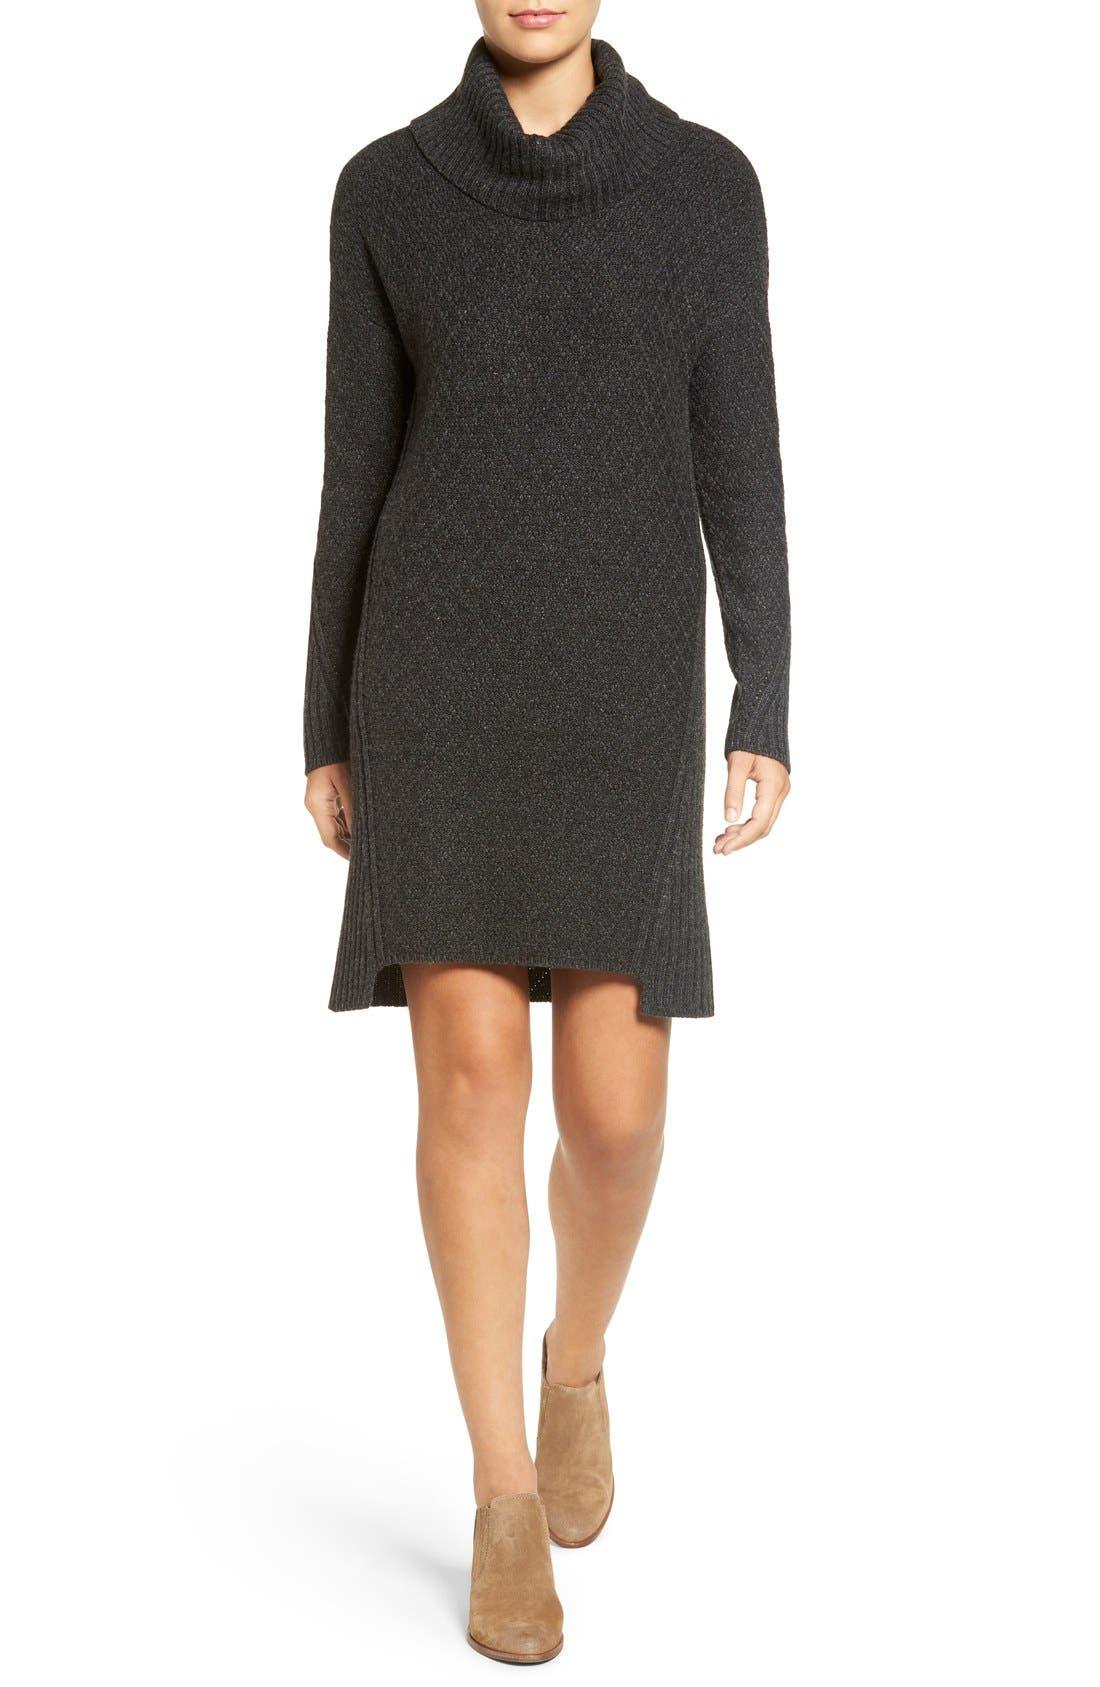 Alternate Image 1 Selected - Treasure&Bond Turtleneck Sweater Dress